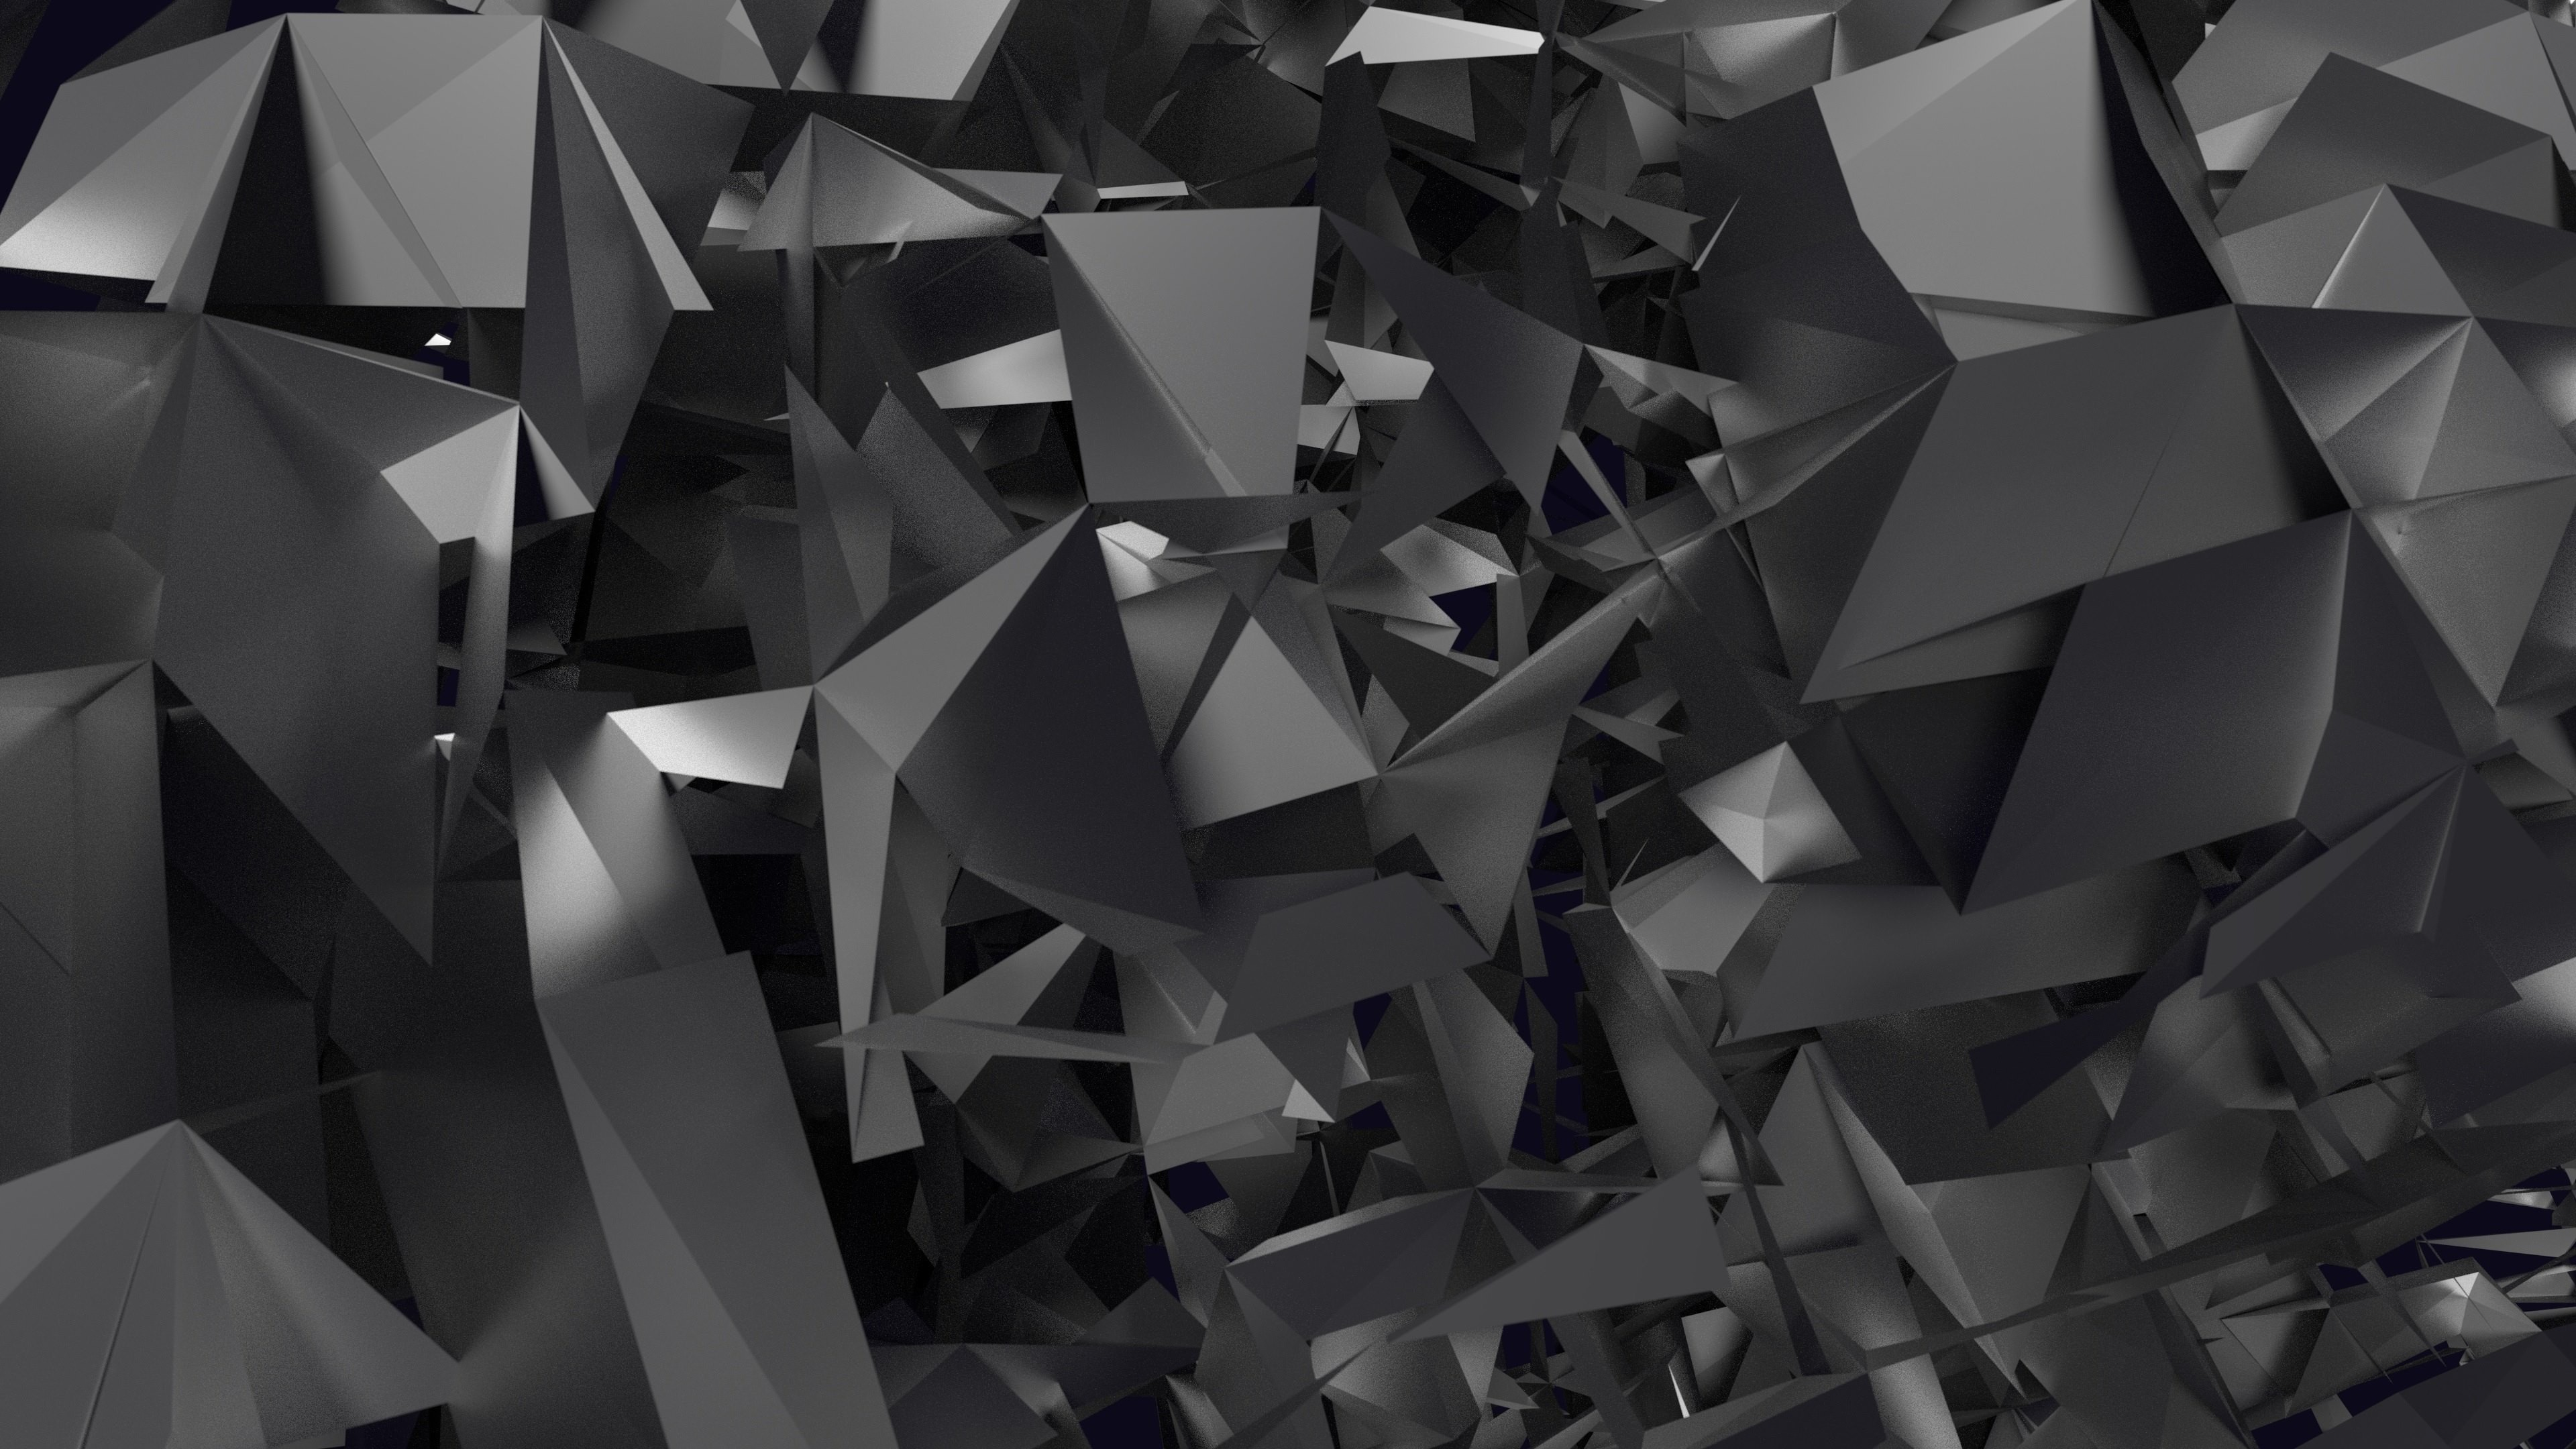 Black Abstract Wallpaper 4k 385252 Hd Wallpaper Backgrounds Download